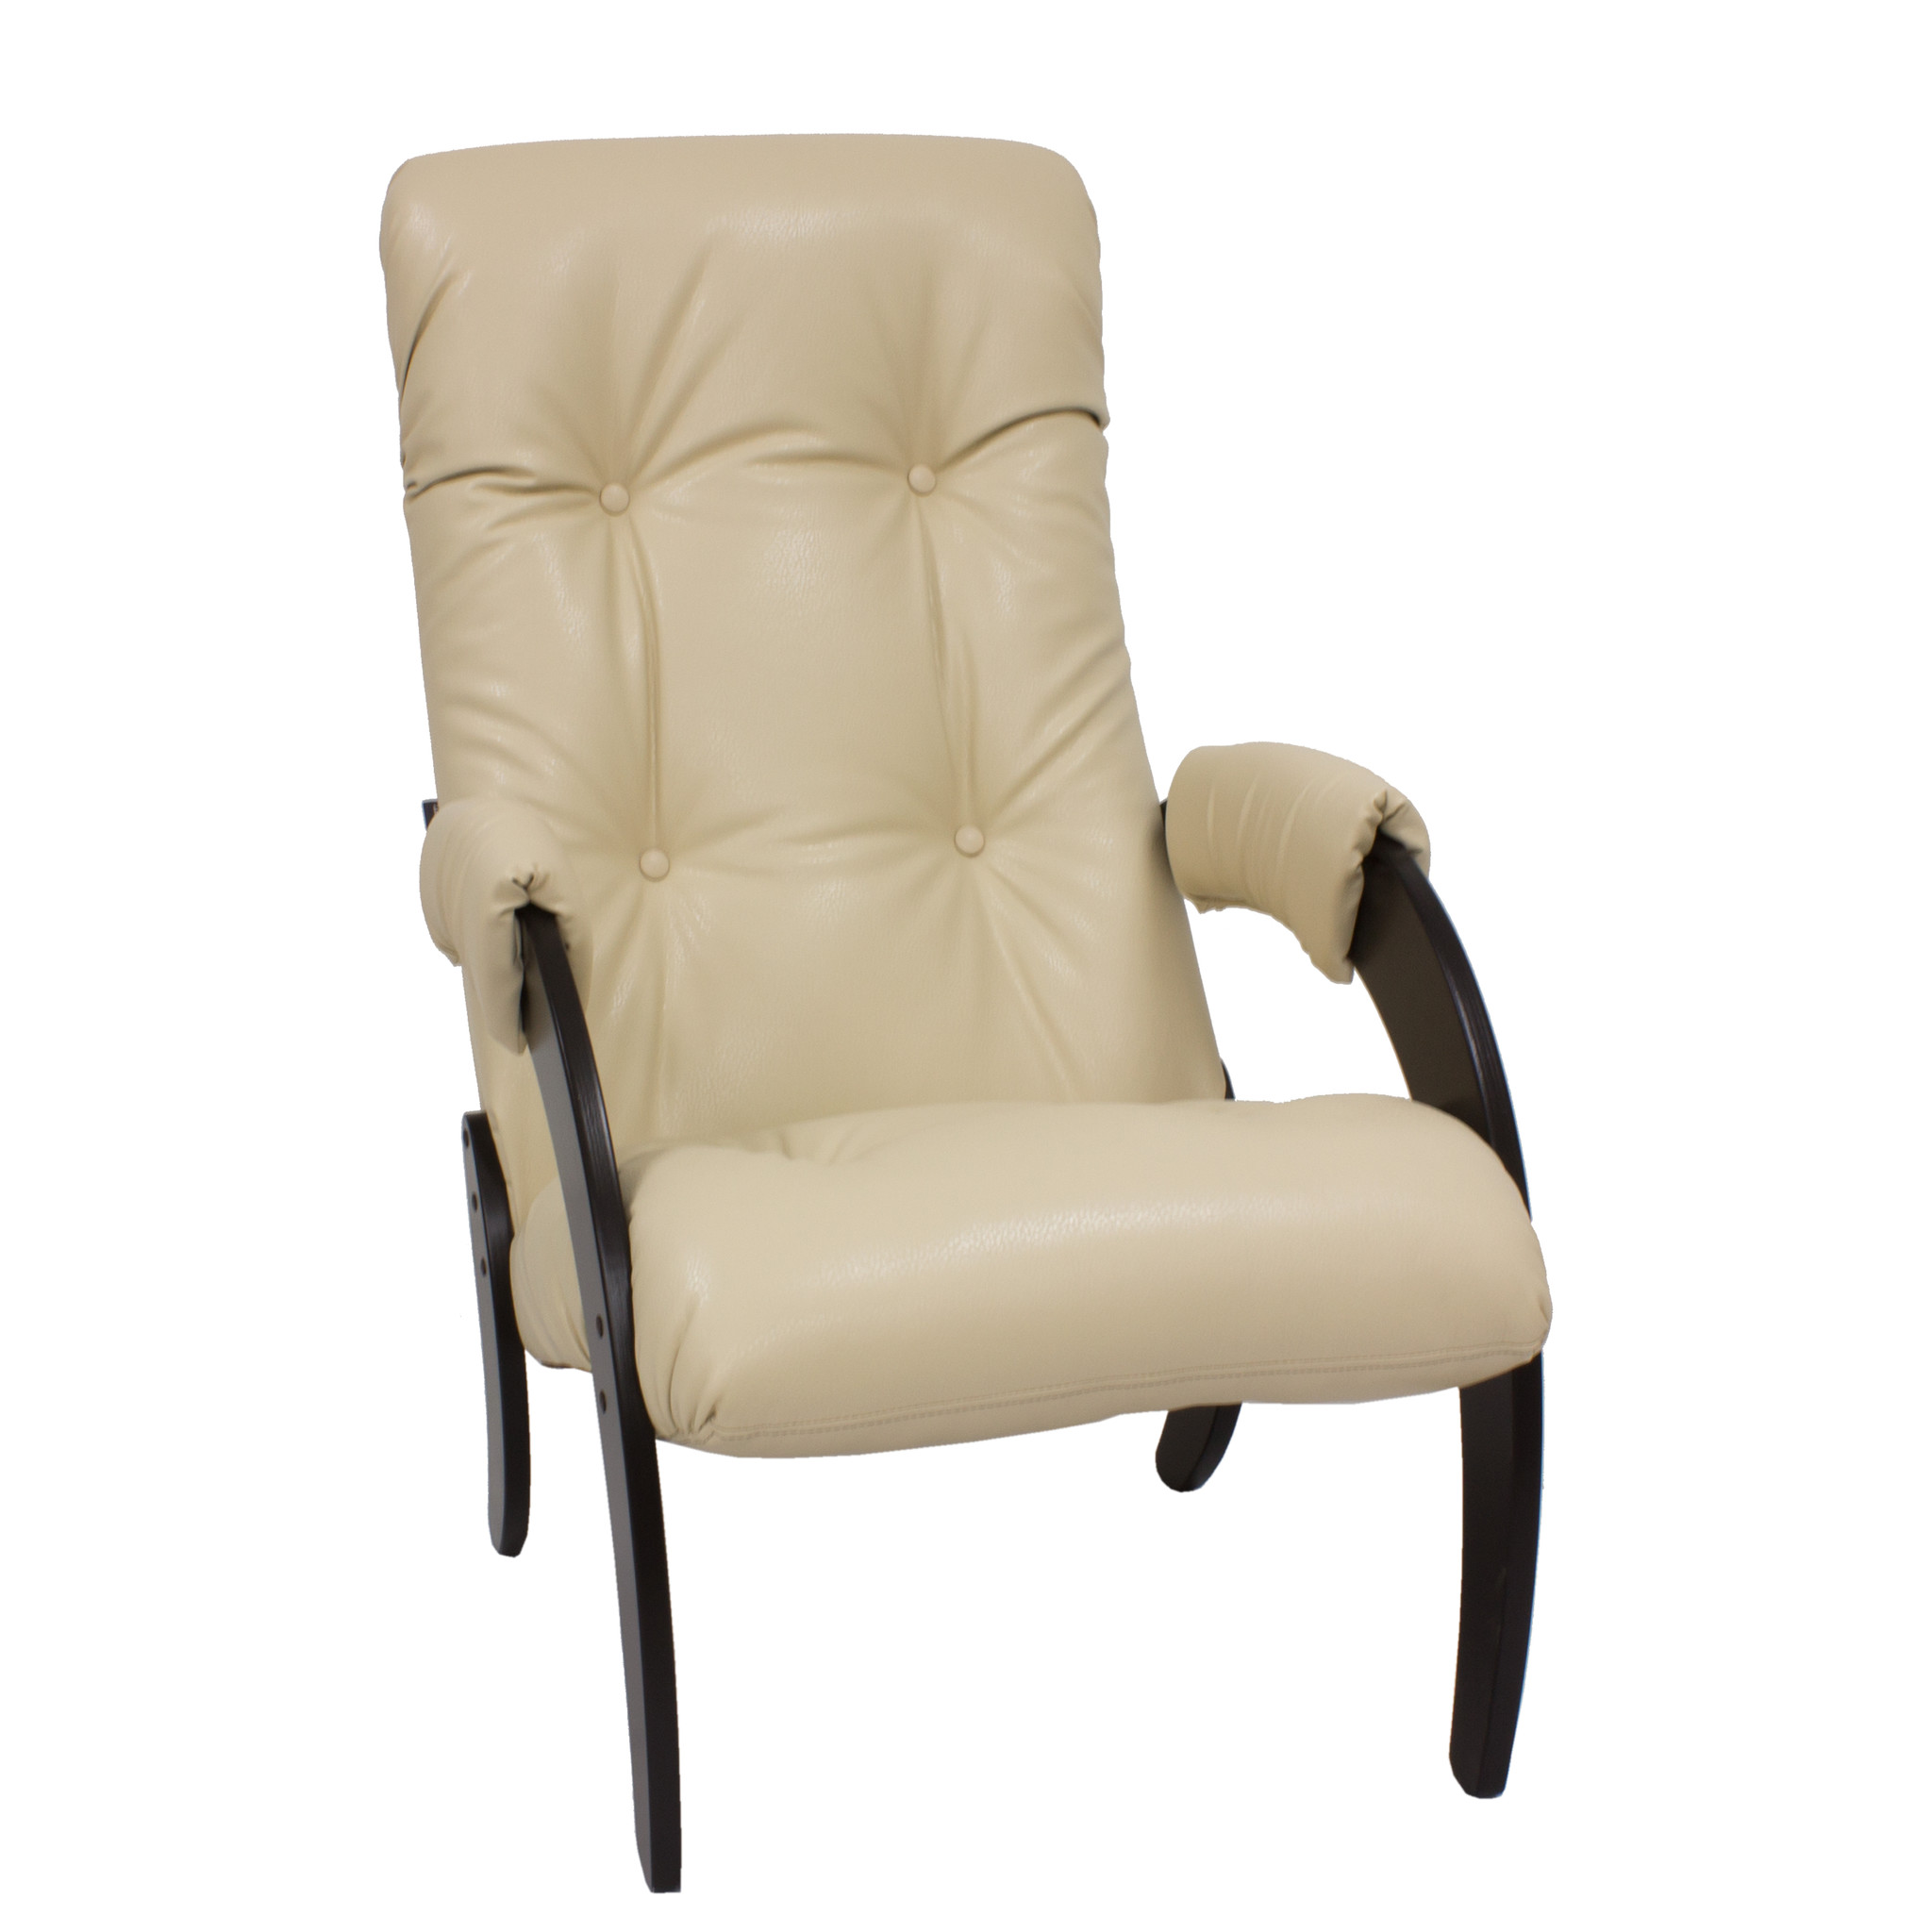 Кресло Комфорт model-61, бежевый